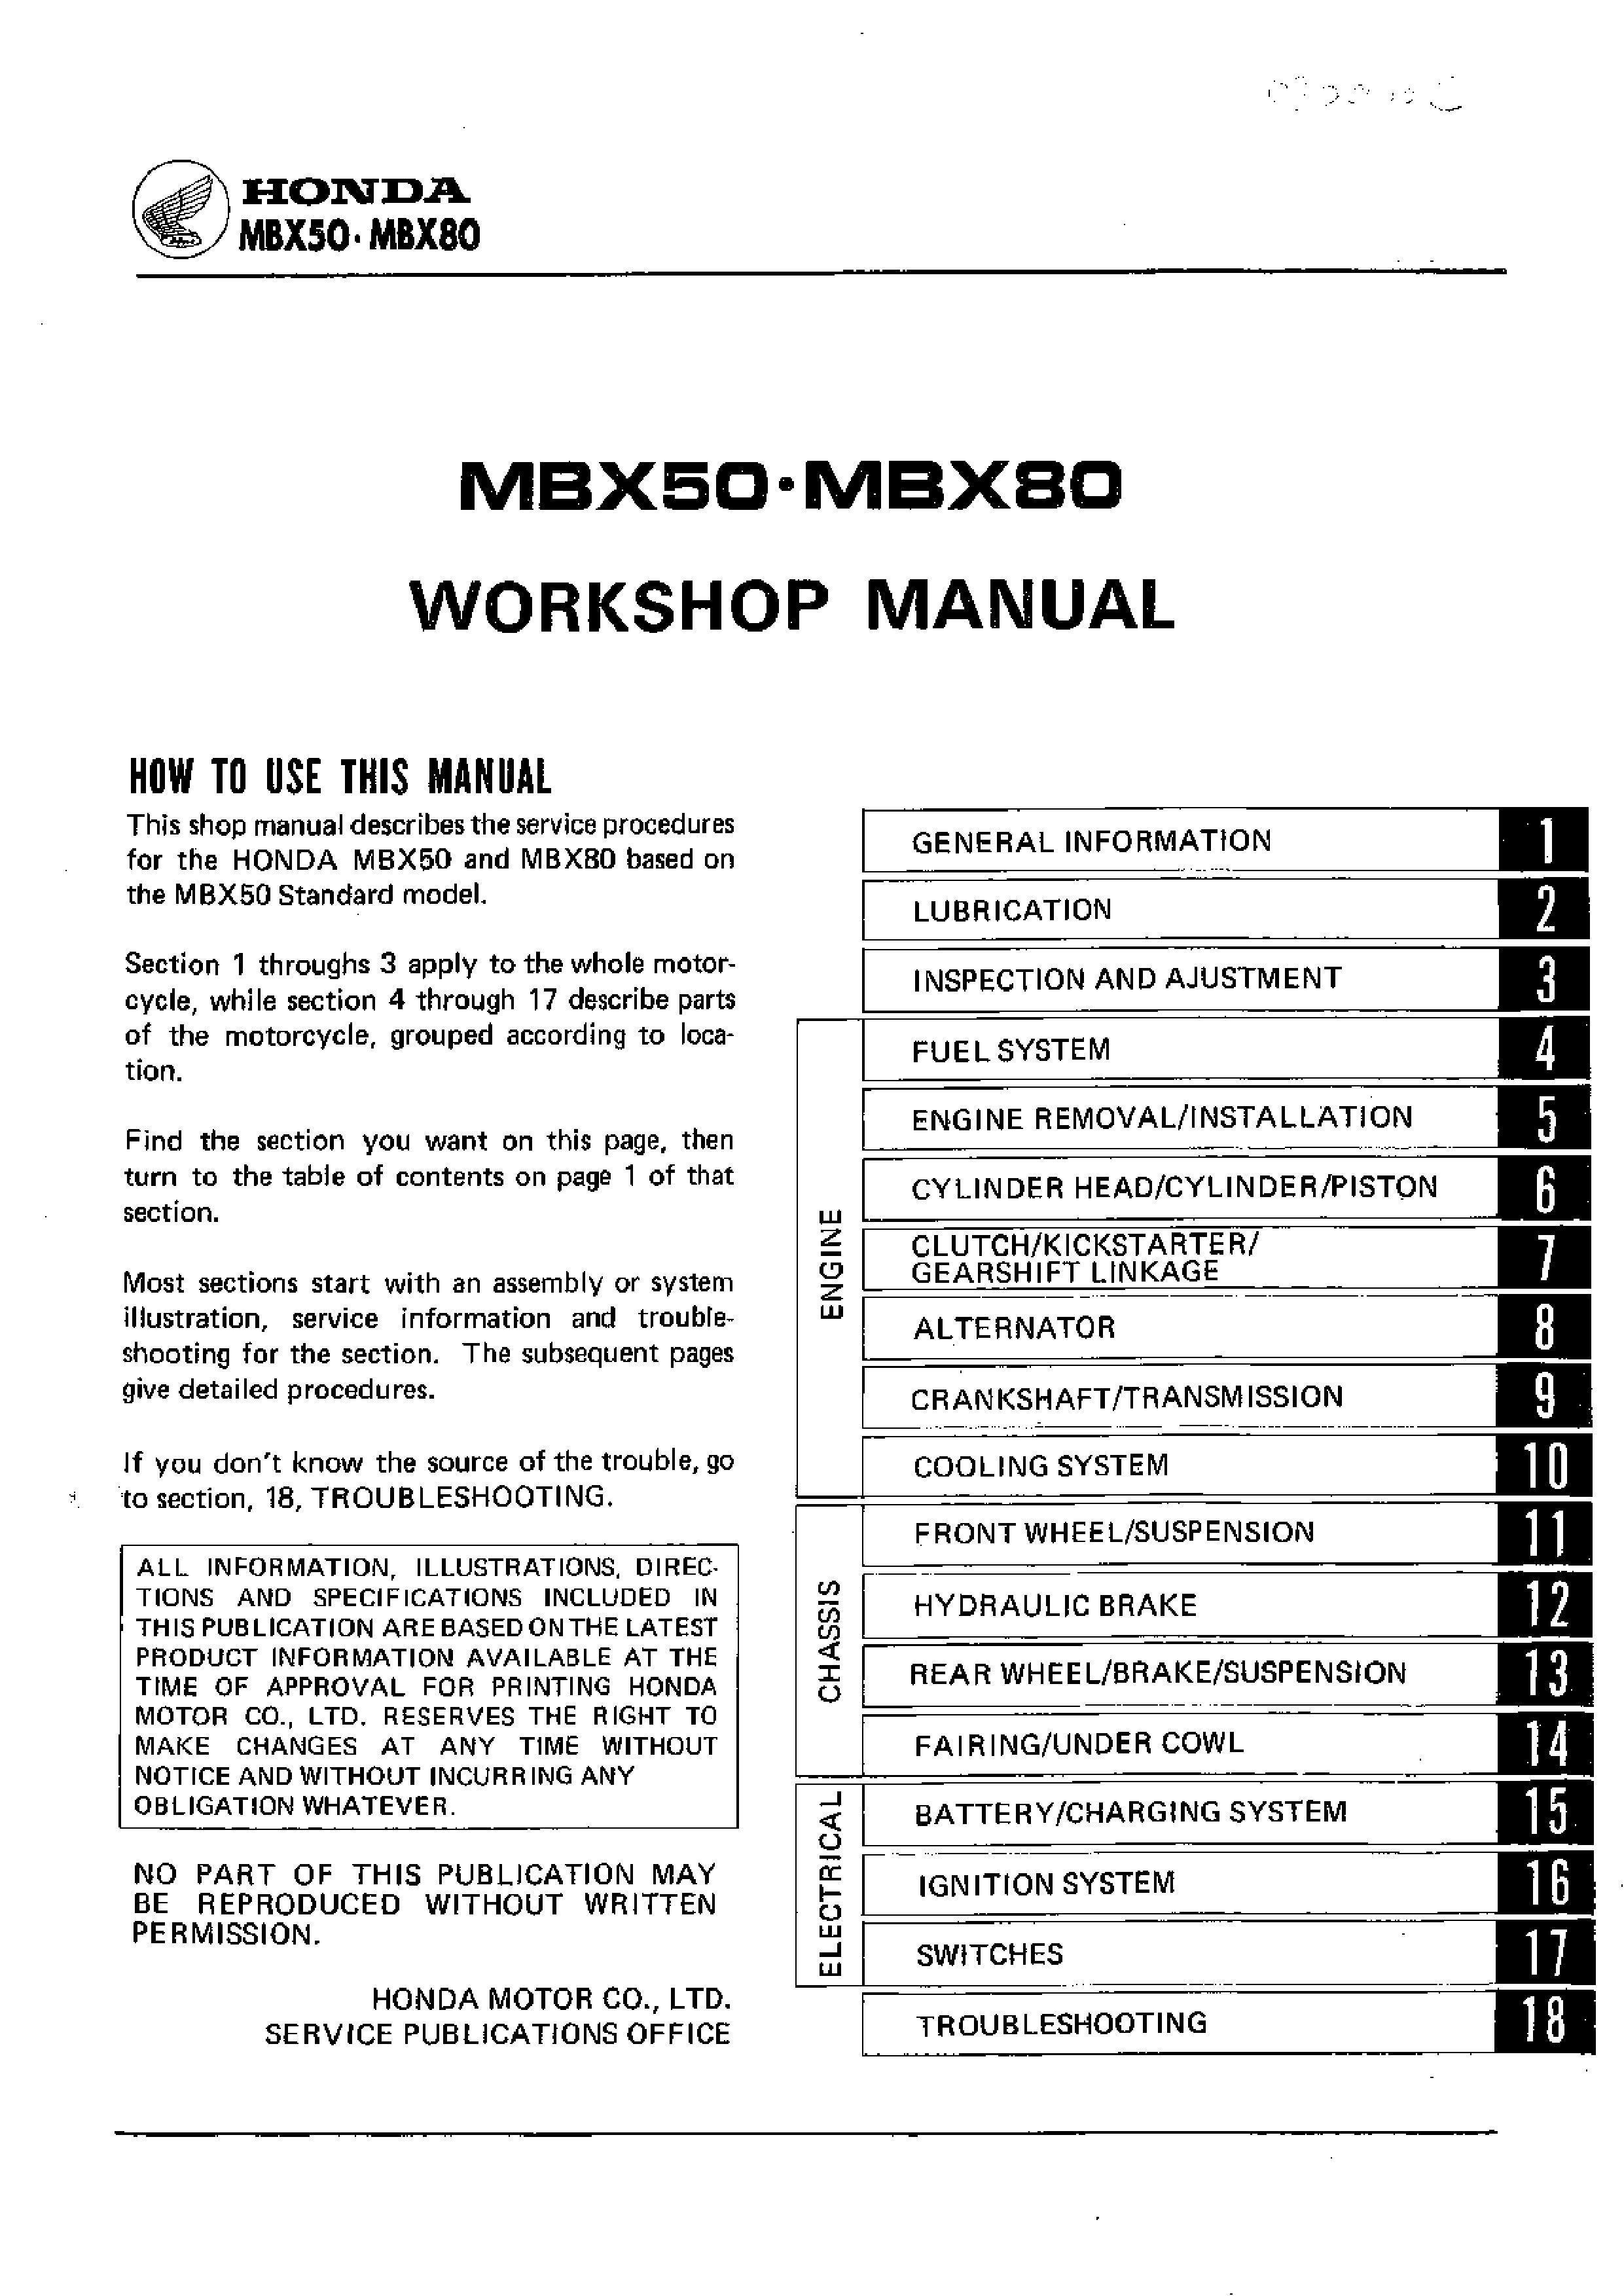 Workshop manual for Honda MBX50